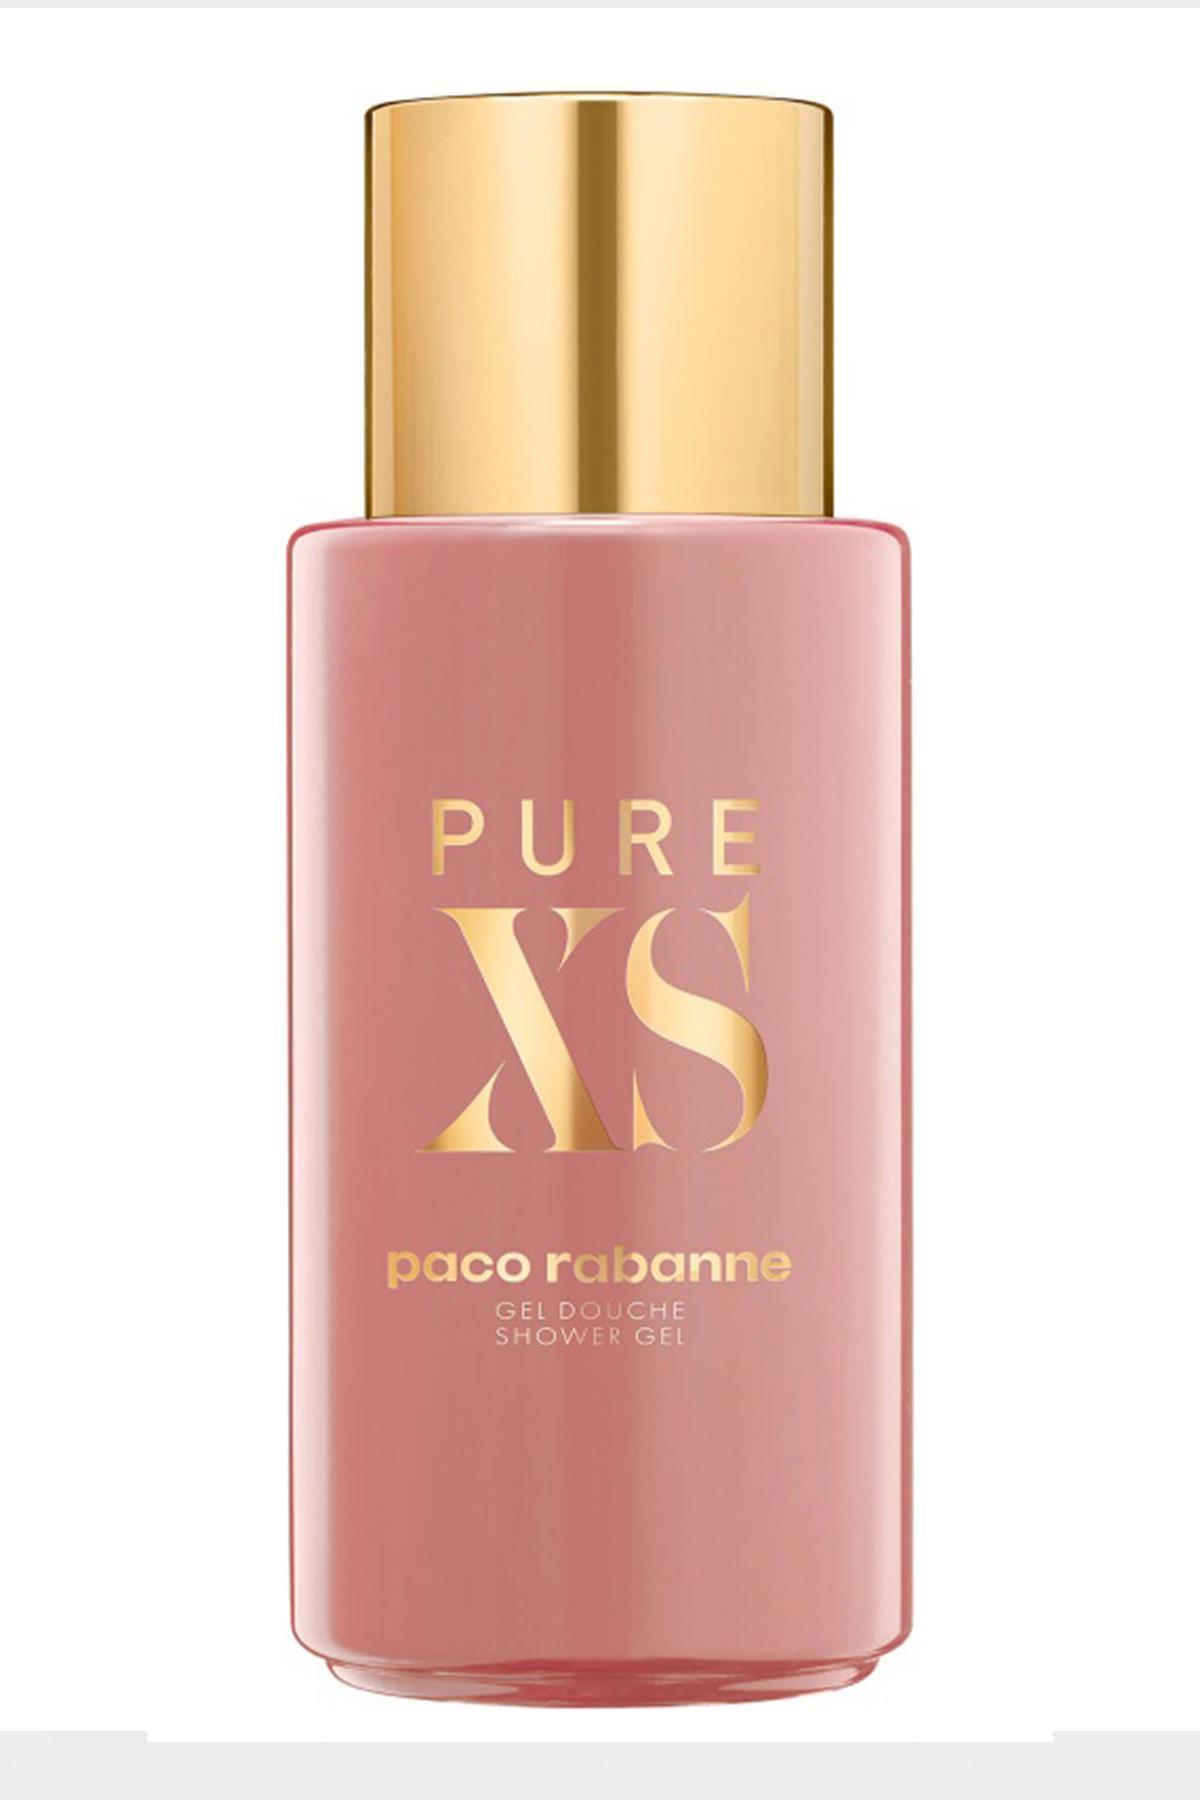 Paco Rabanne Pure XS Duş Jeli 200 ml